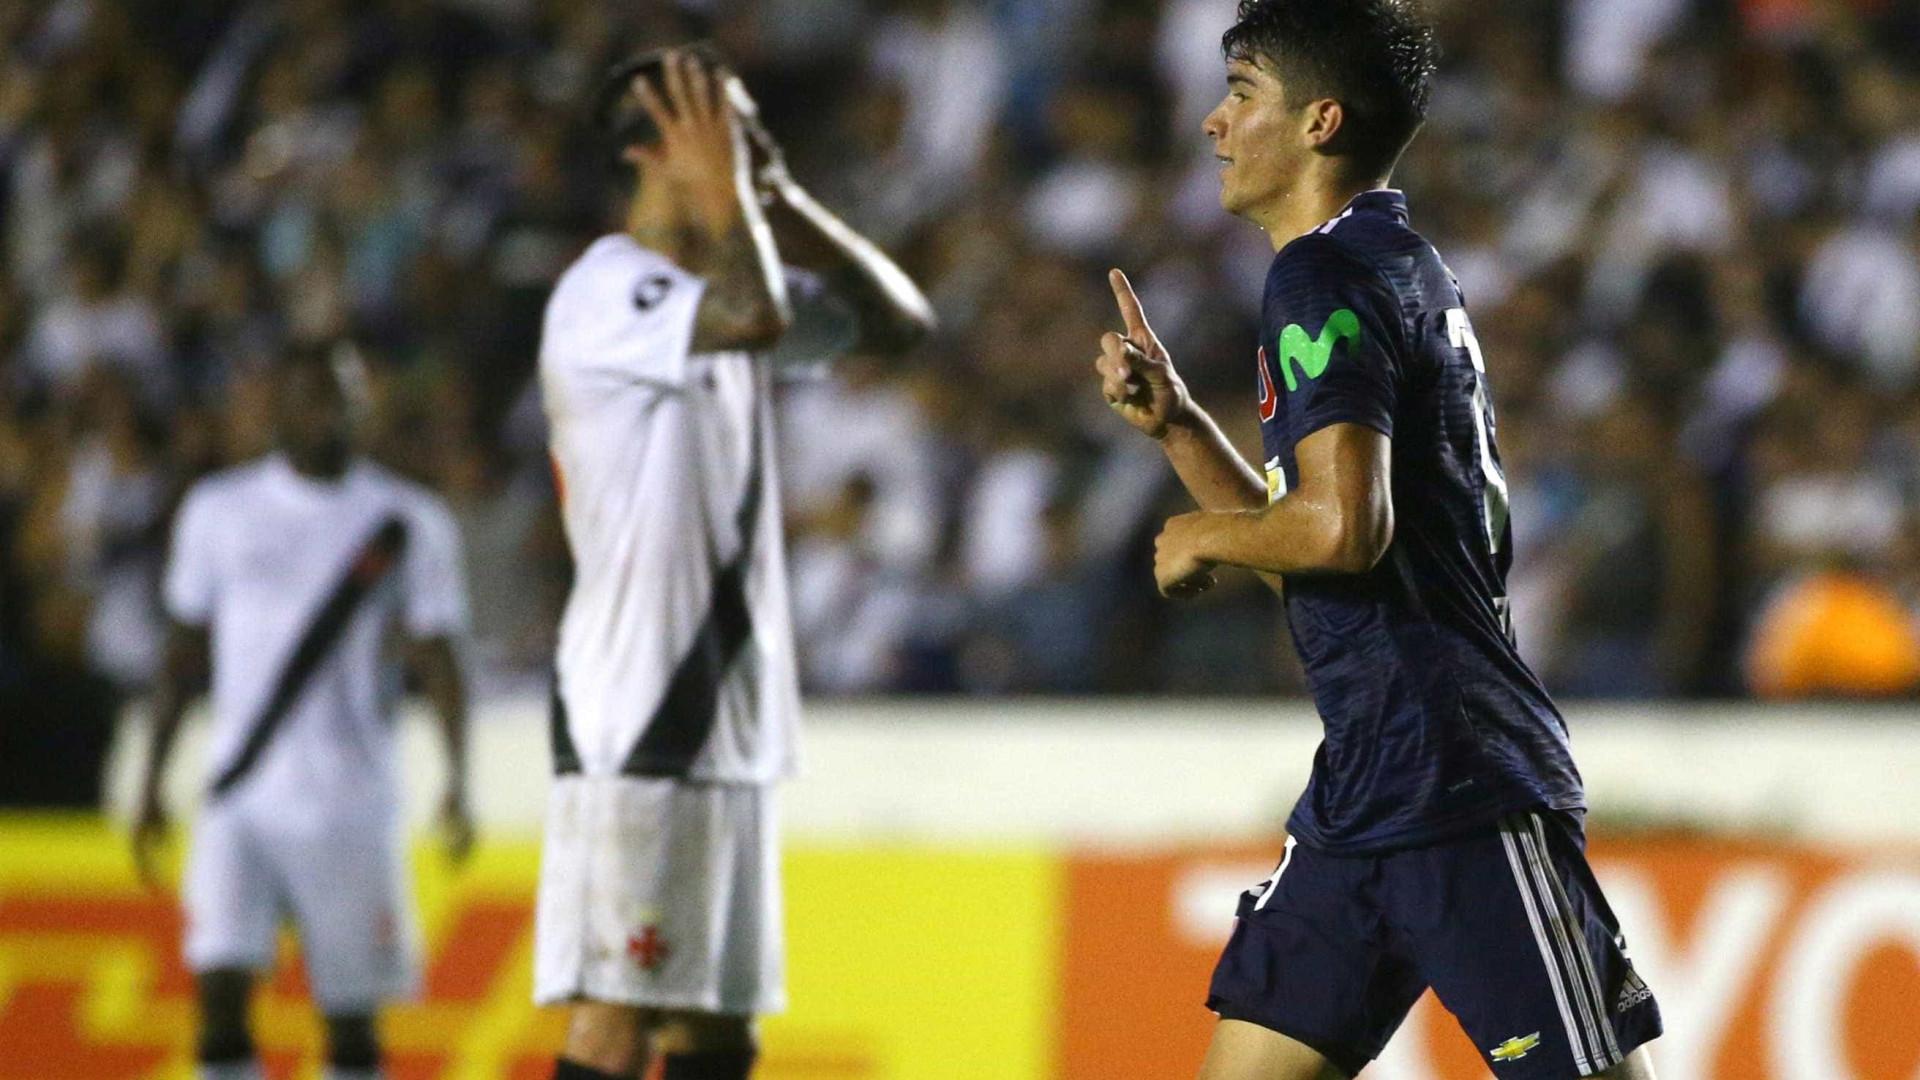 Vasco perde para chilenos na estreia da fase de grupos da Libertadores